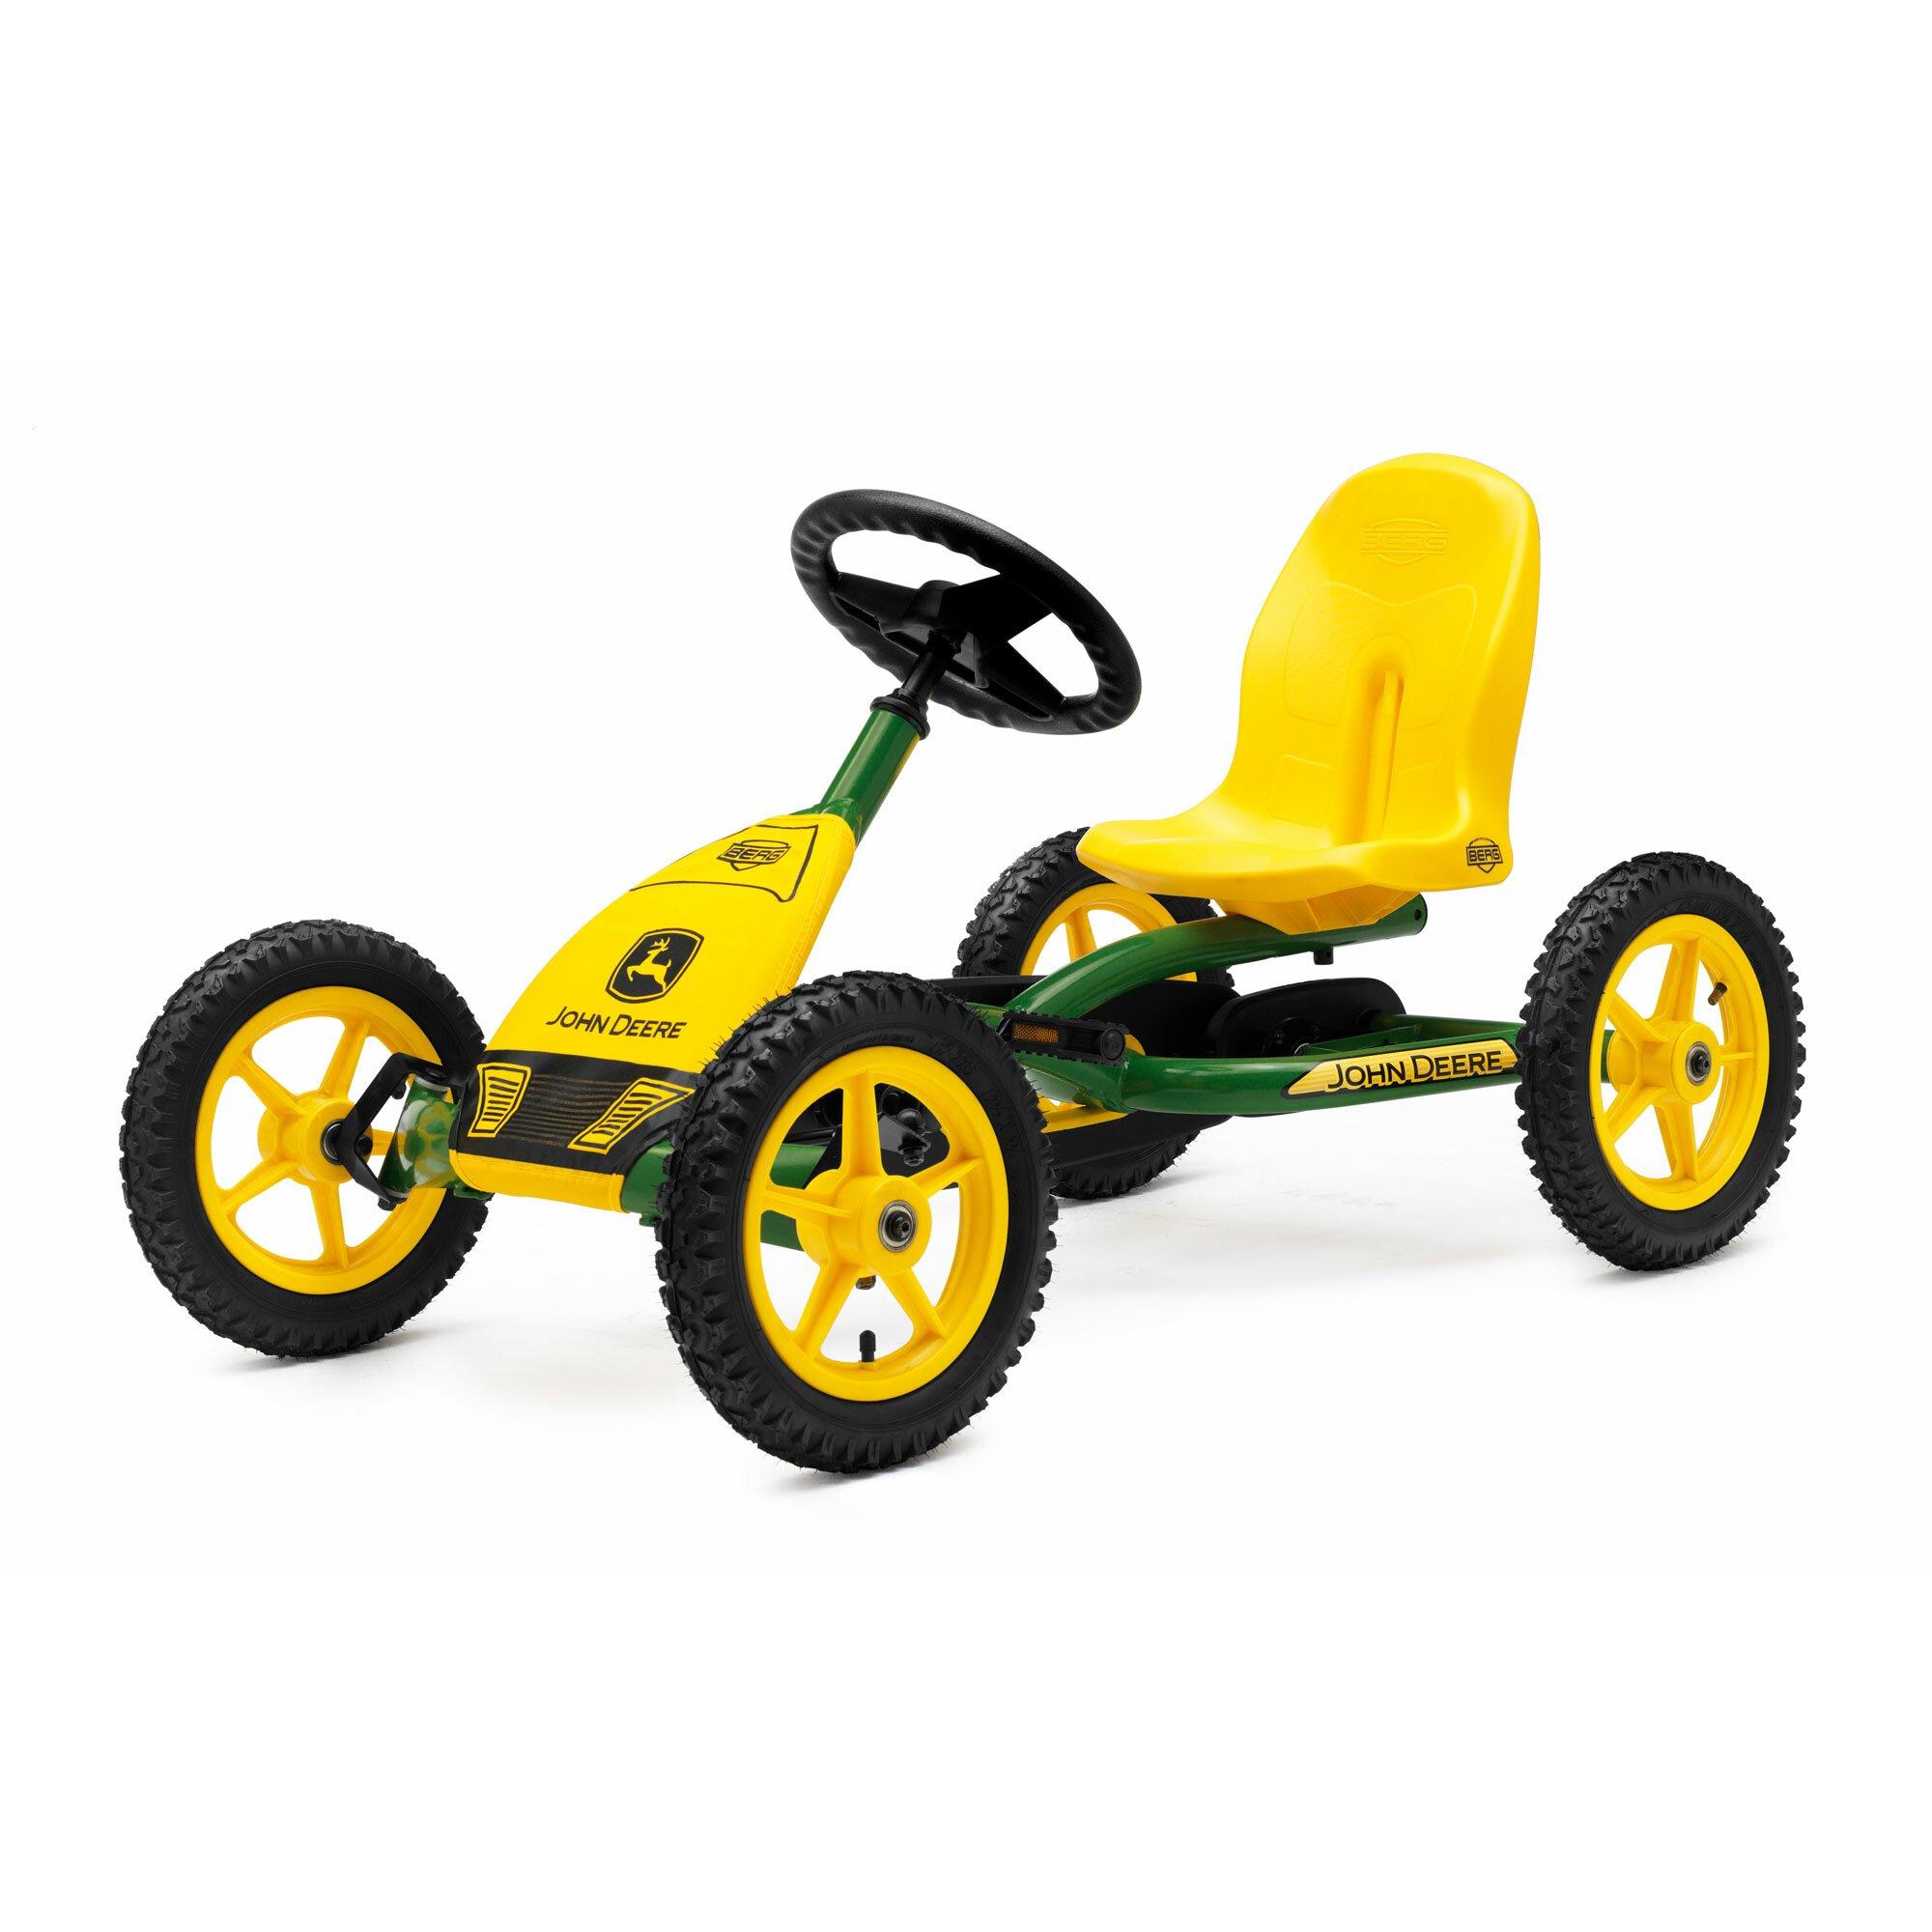 Berg Toys Buddy John Deere Pedal Go Kart & Reviews | Wayfair